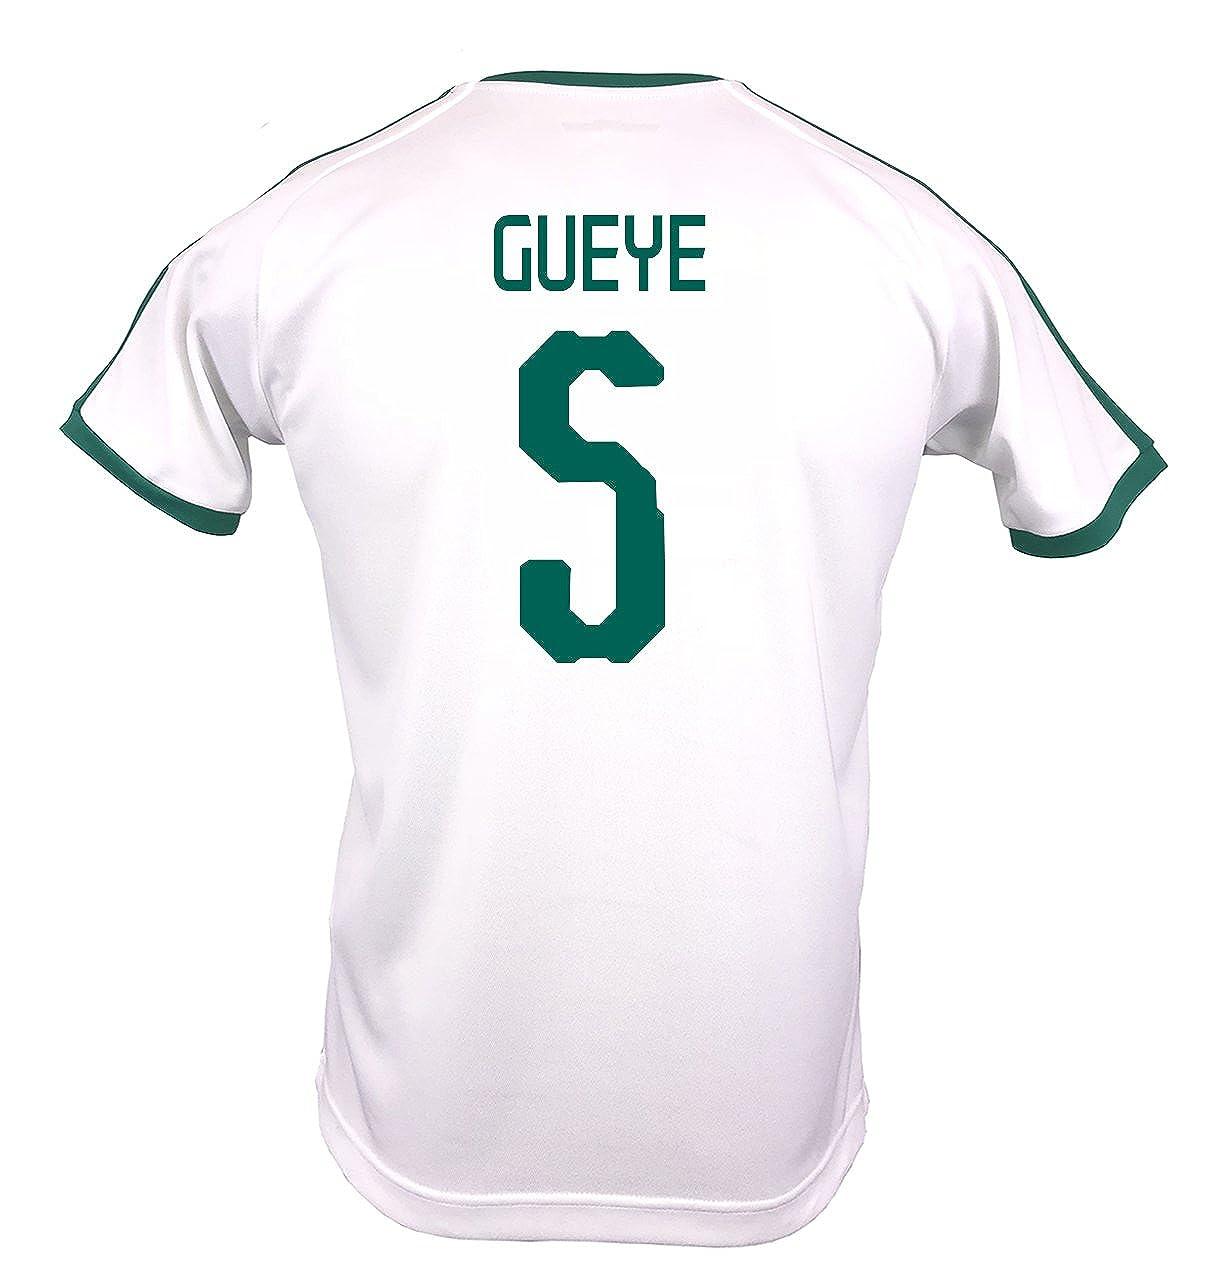 Puma Men's GUEYE # 5 Senegal Home Soccer Stadium Jersey World Cup Russia 2018/サッカーユニフォーム セネガル ホーム用 ゲイェ # 5 B07DMCZHCL US X-Large